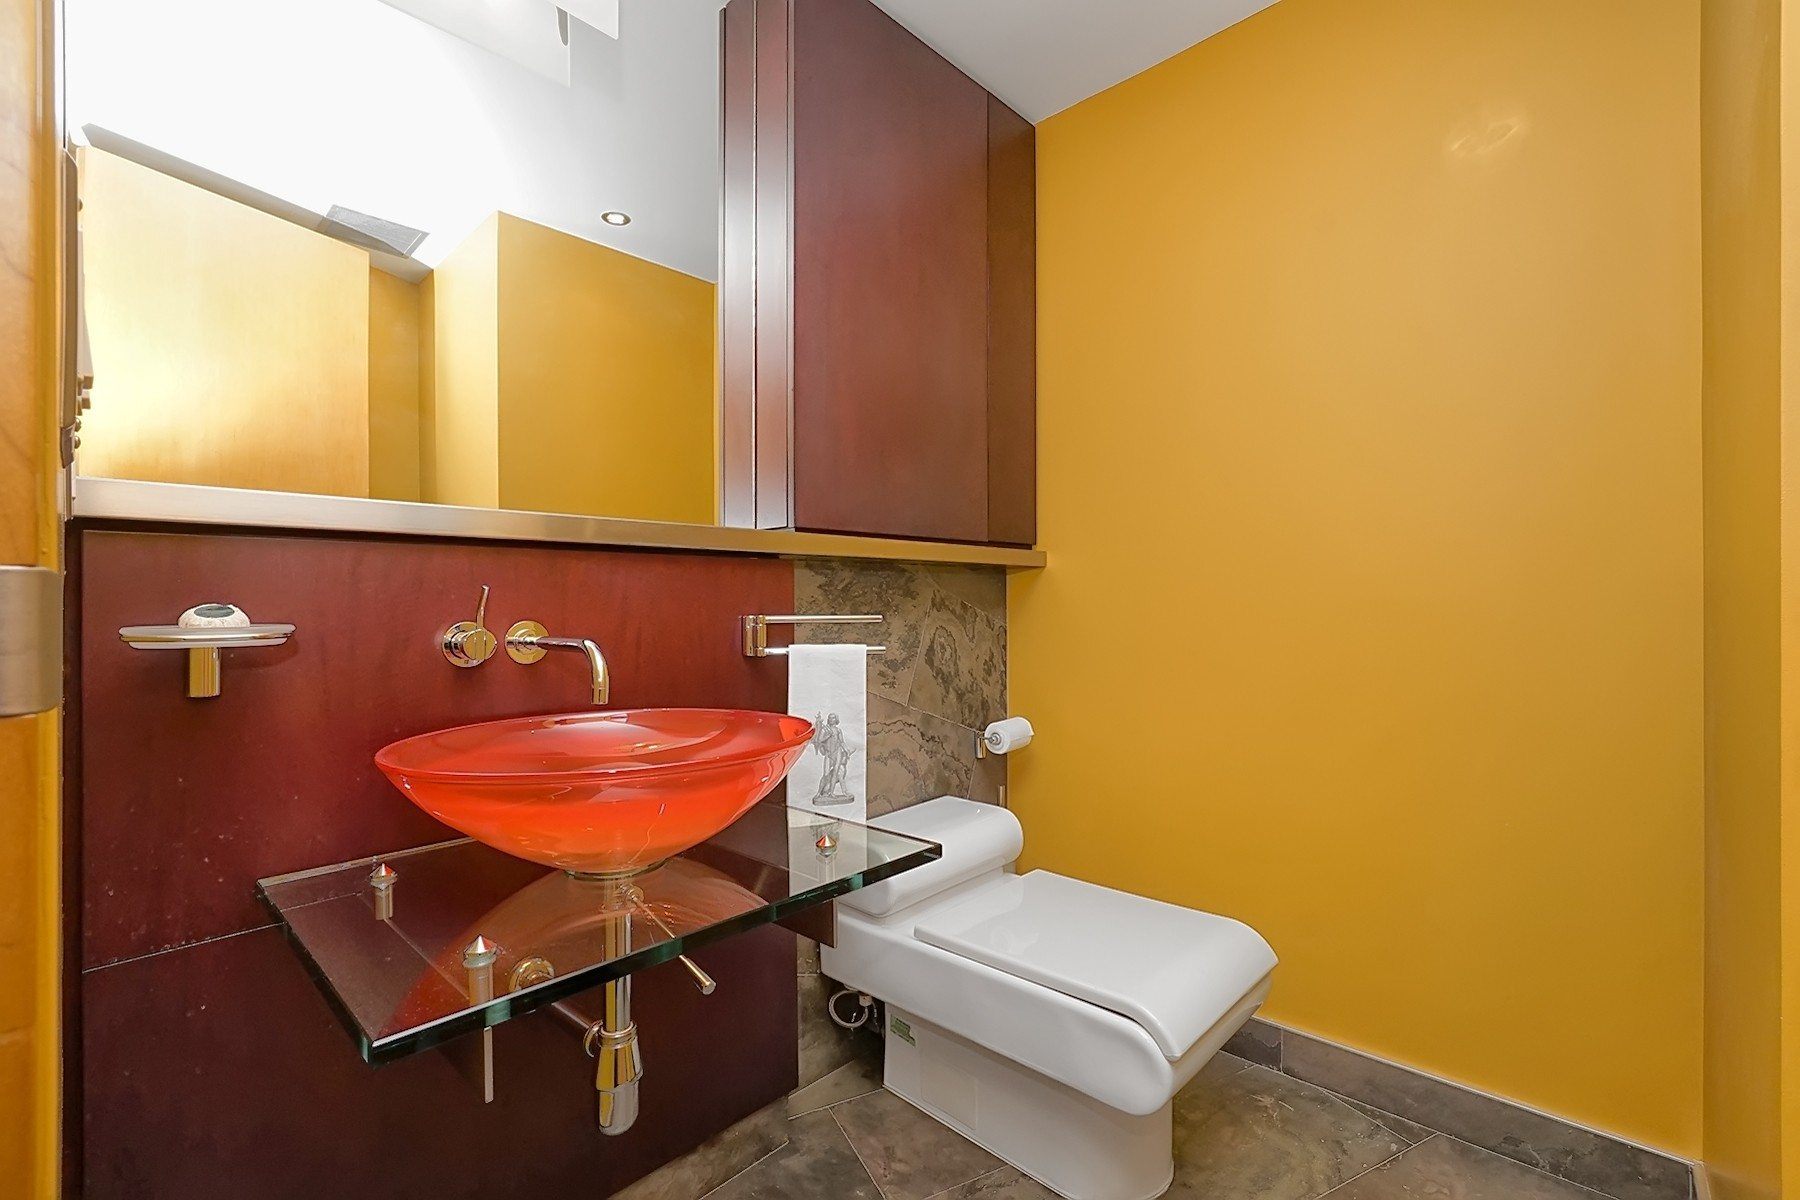 toronto-condo-for-sale-71-simcoe-street-6